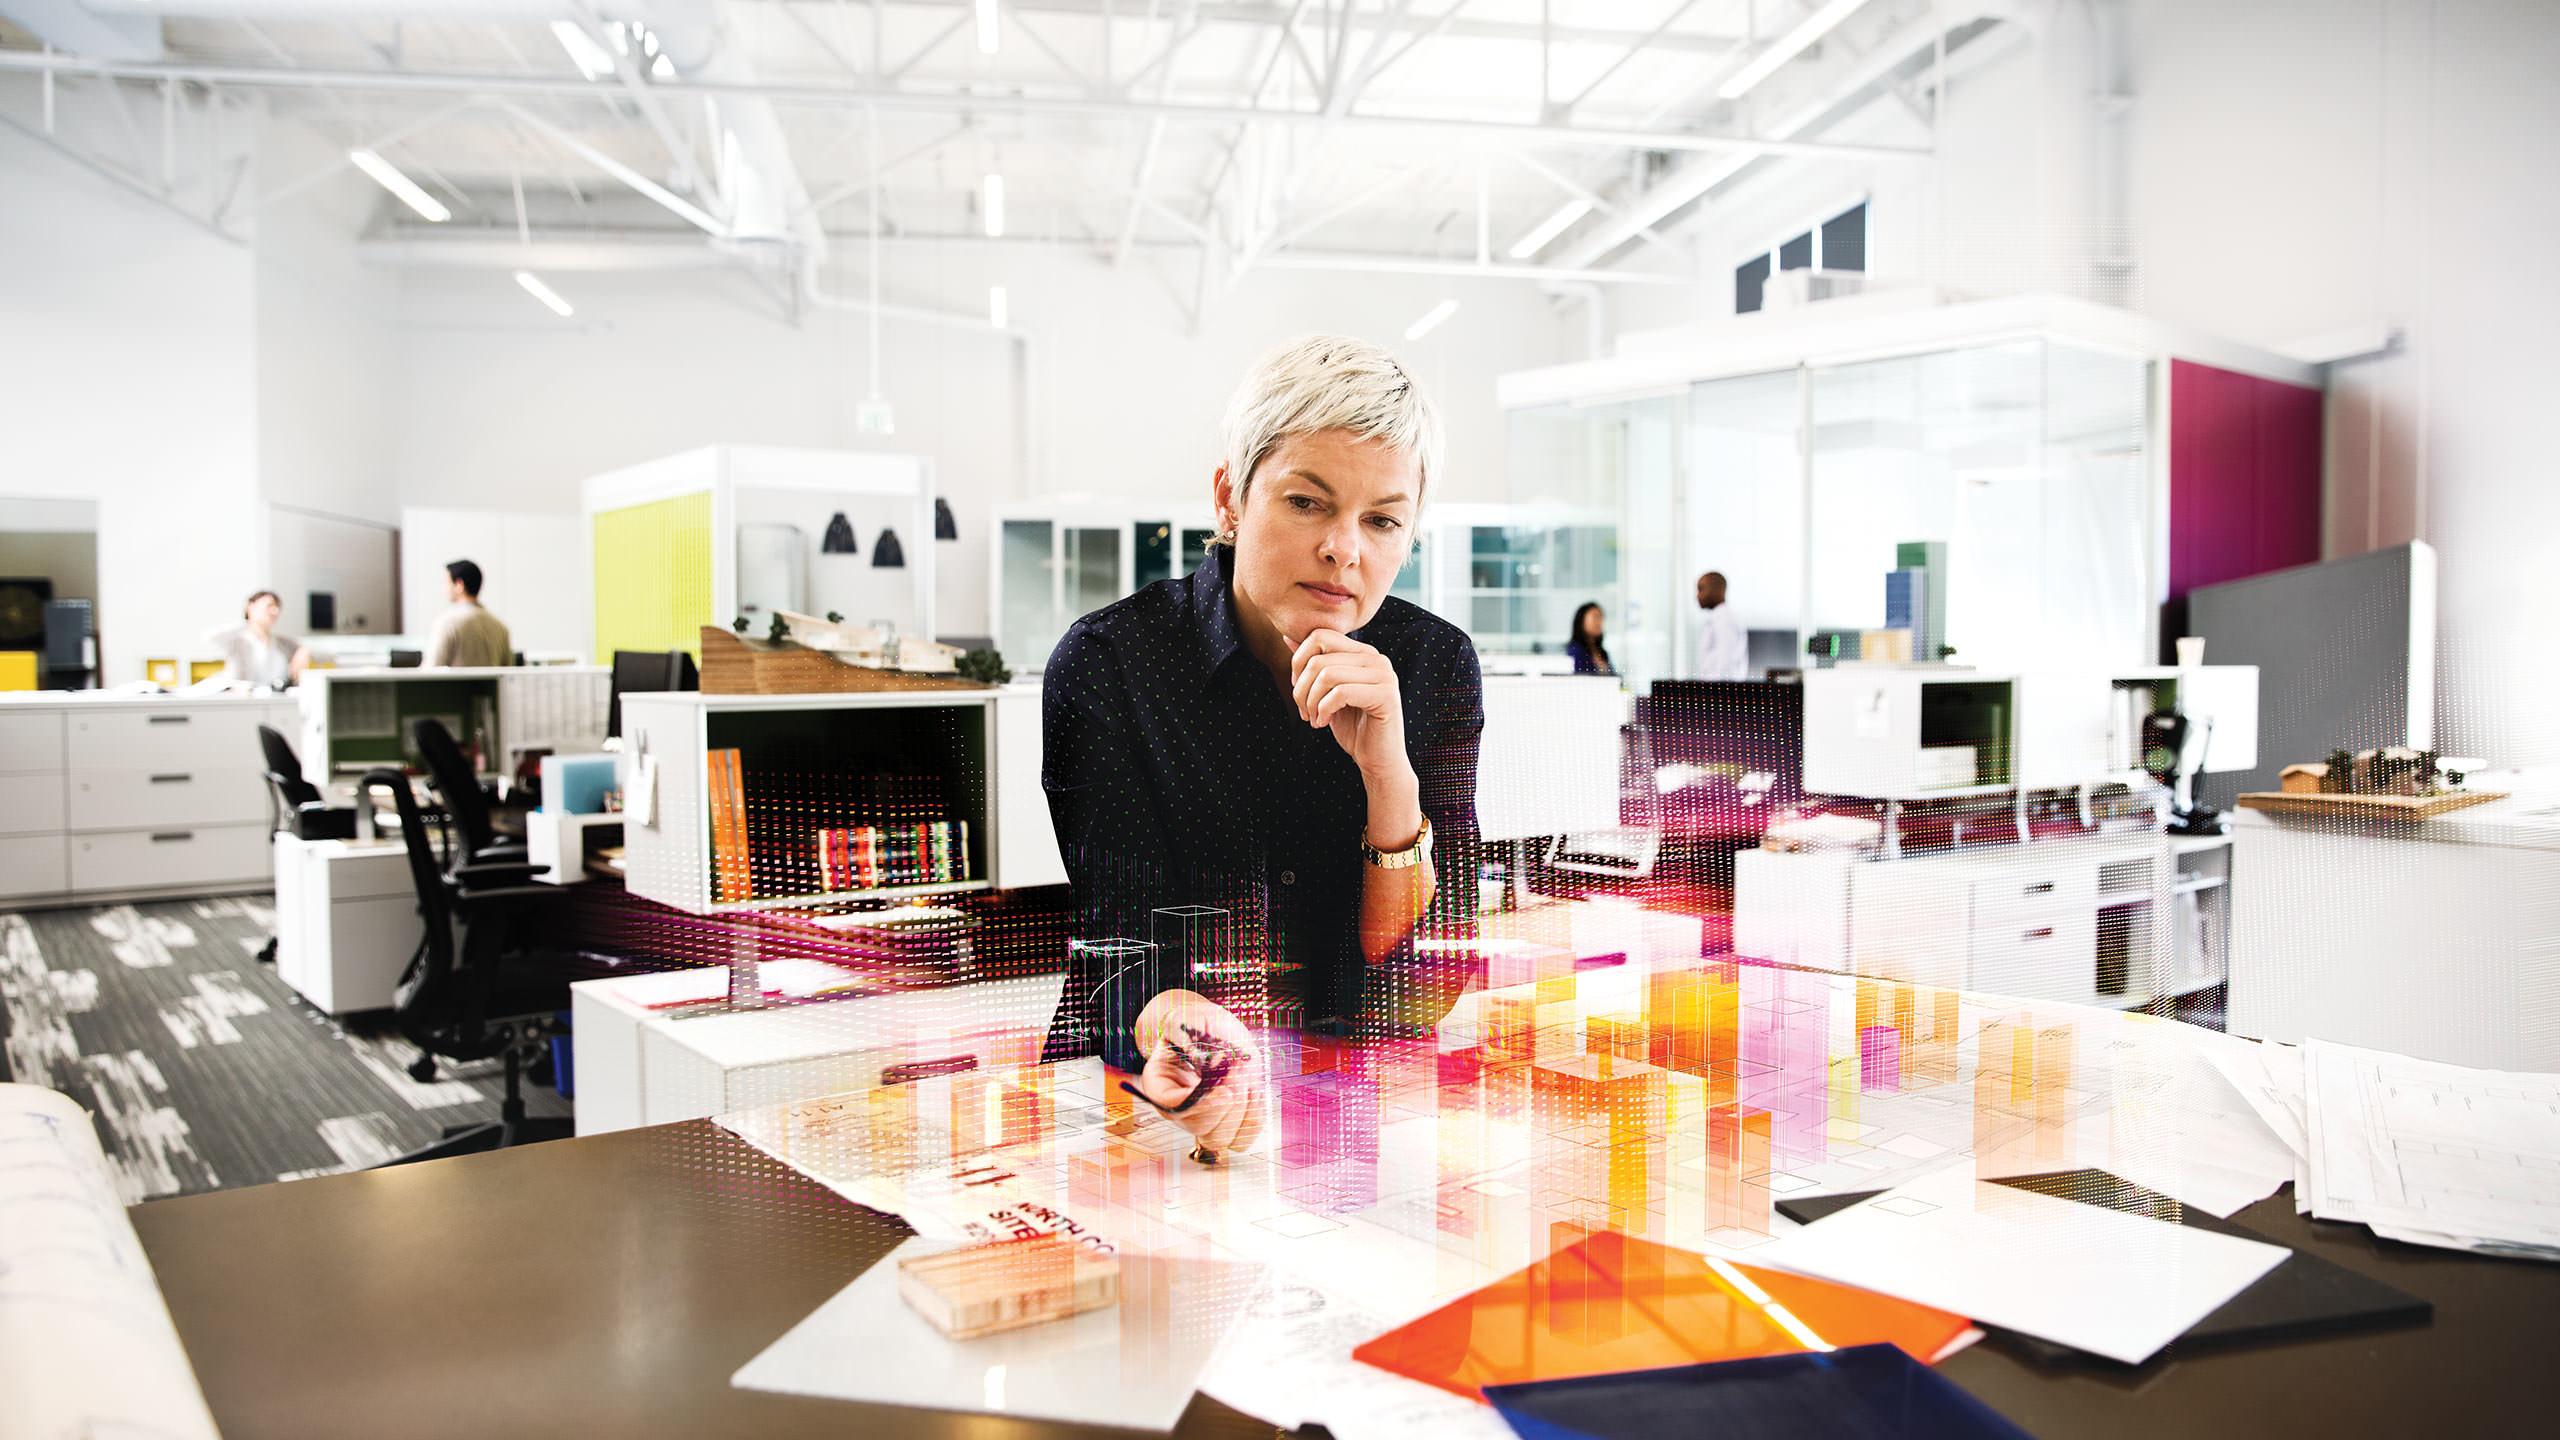 citrix-photography-woman-architect